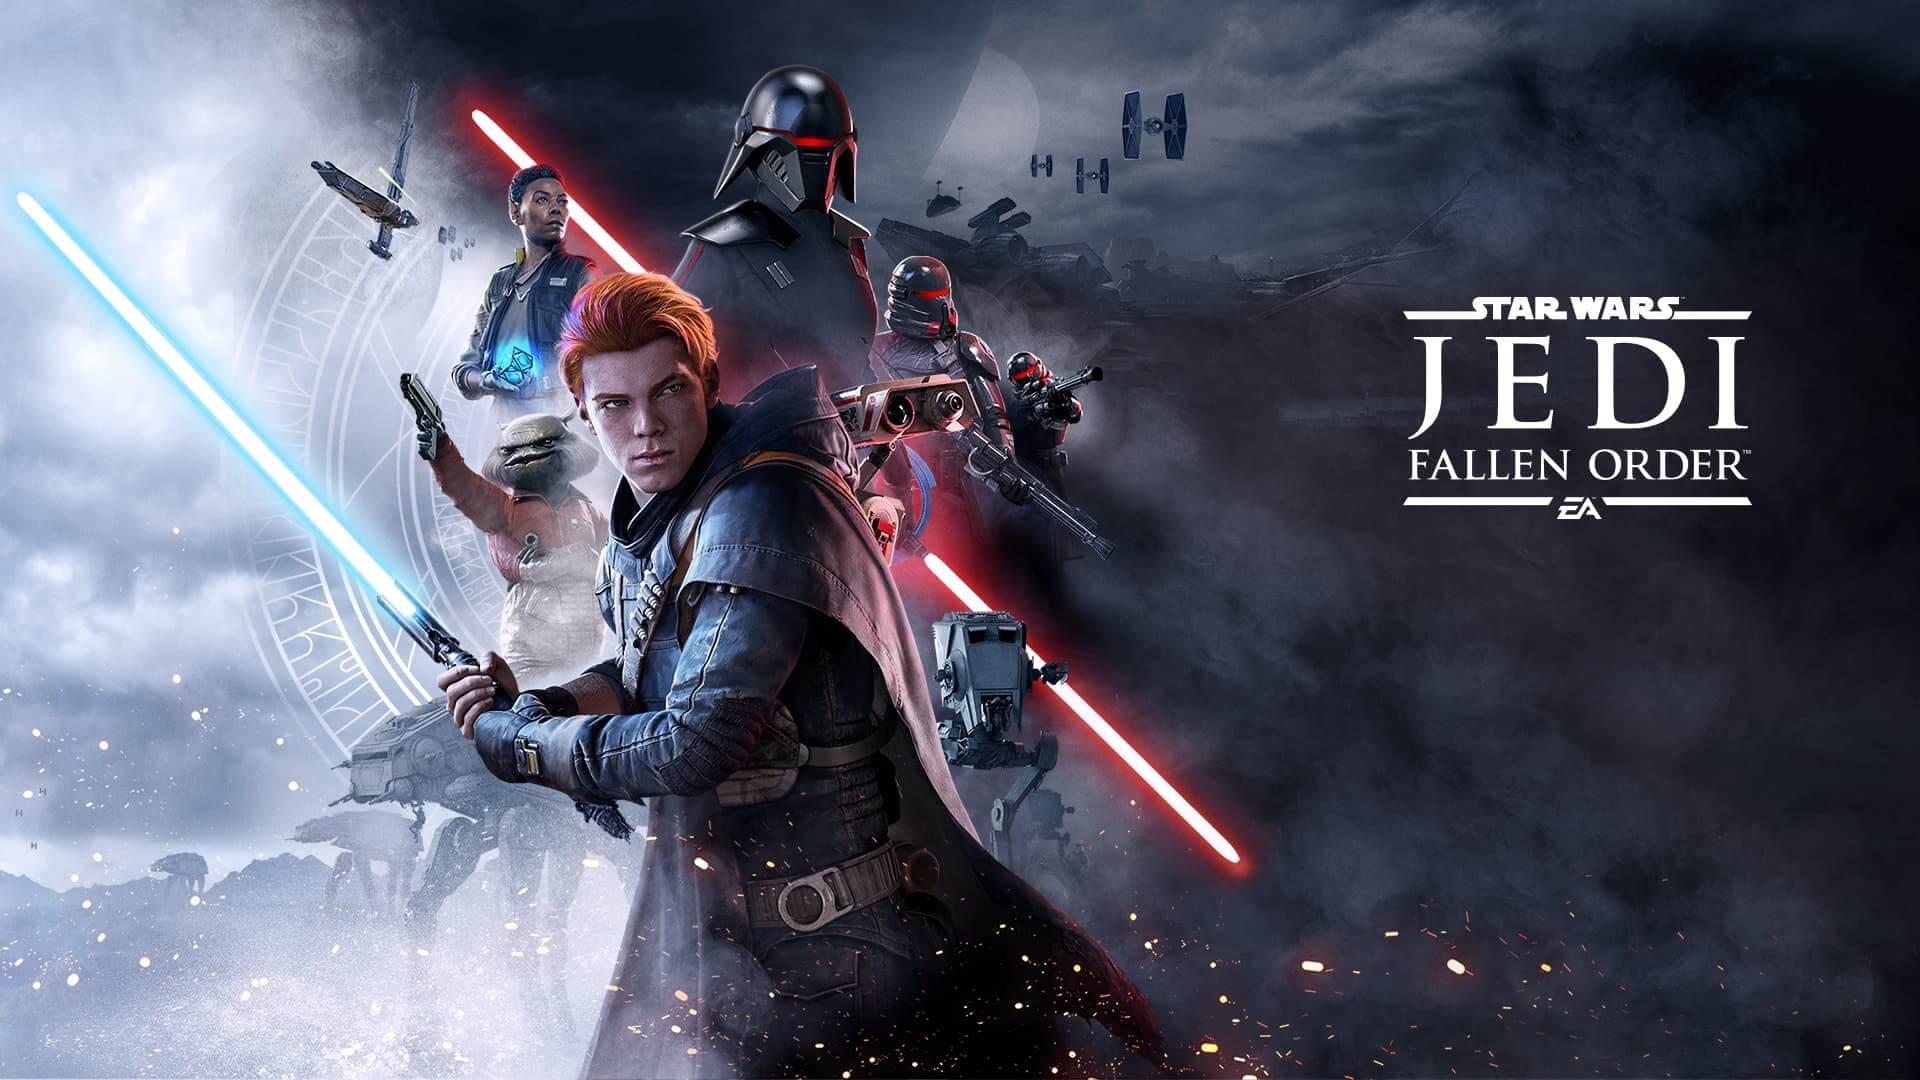 Star Wars Jedi Fallen Order recensione: la storia di Cal Kestis thumbnail